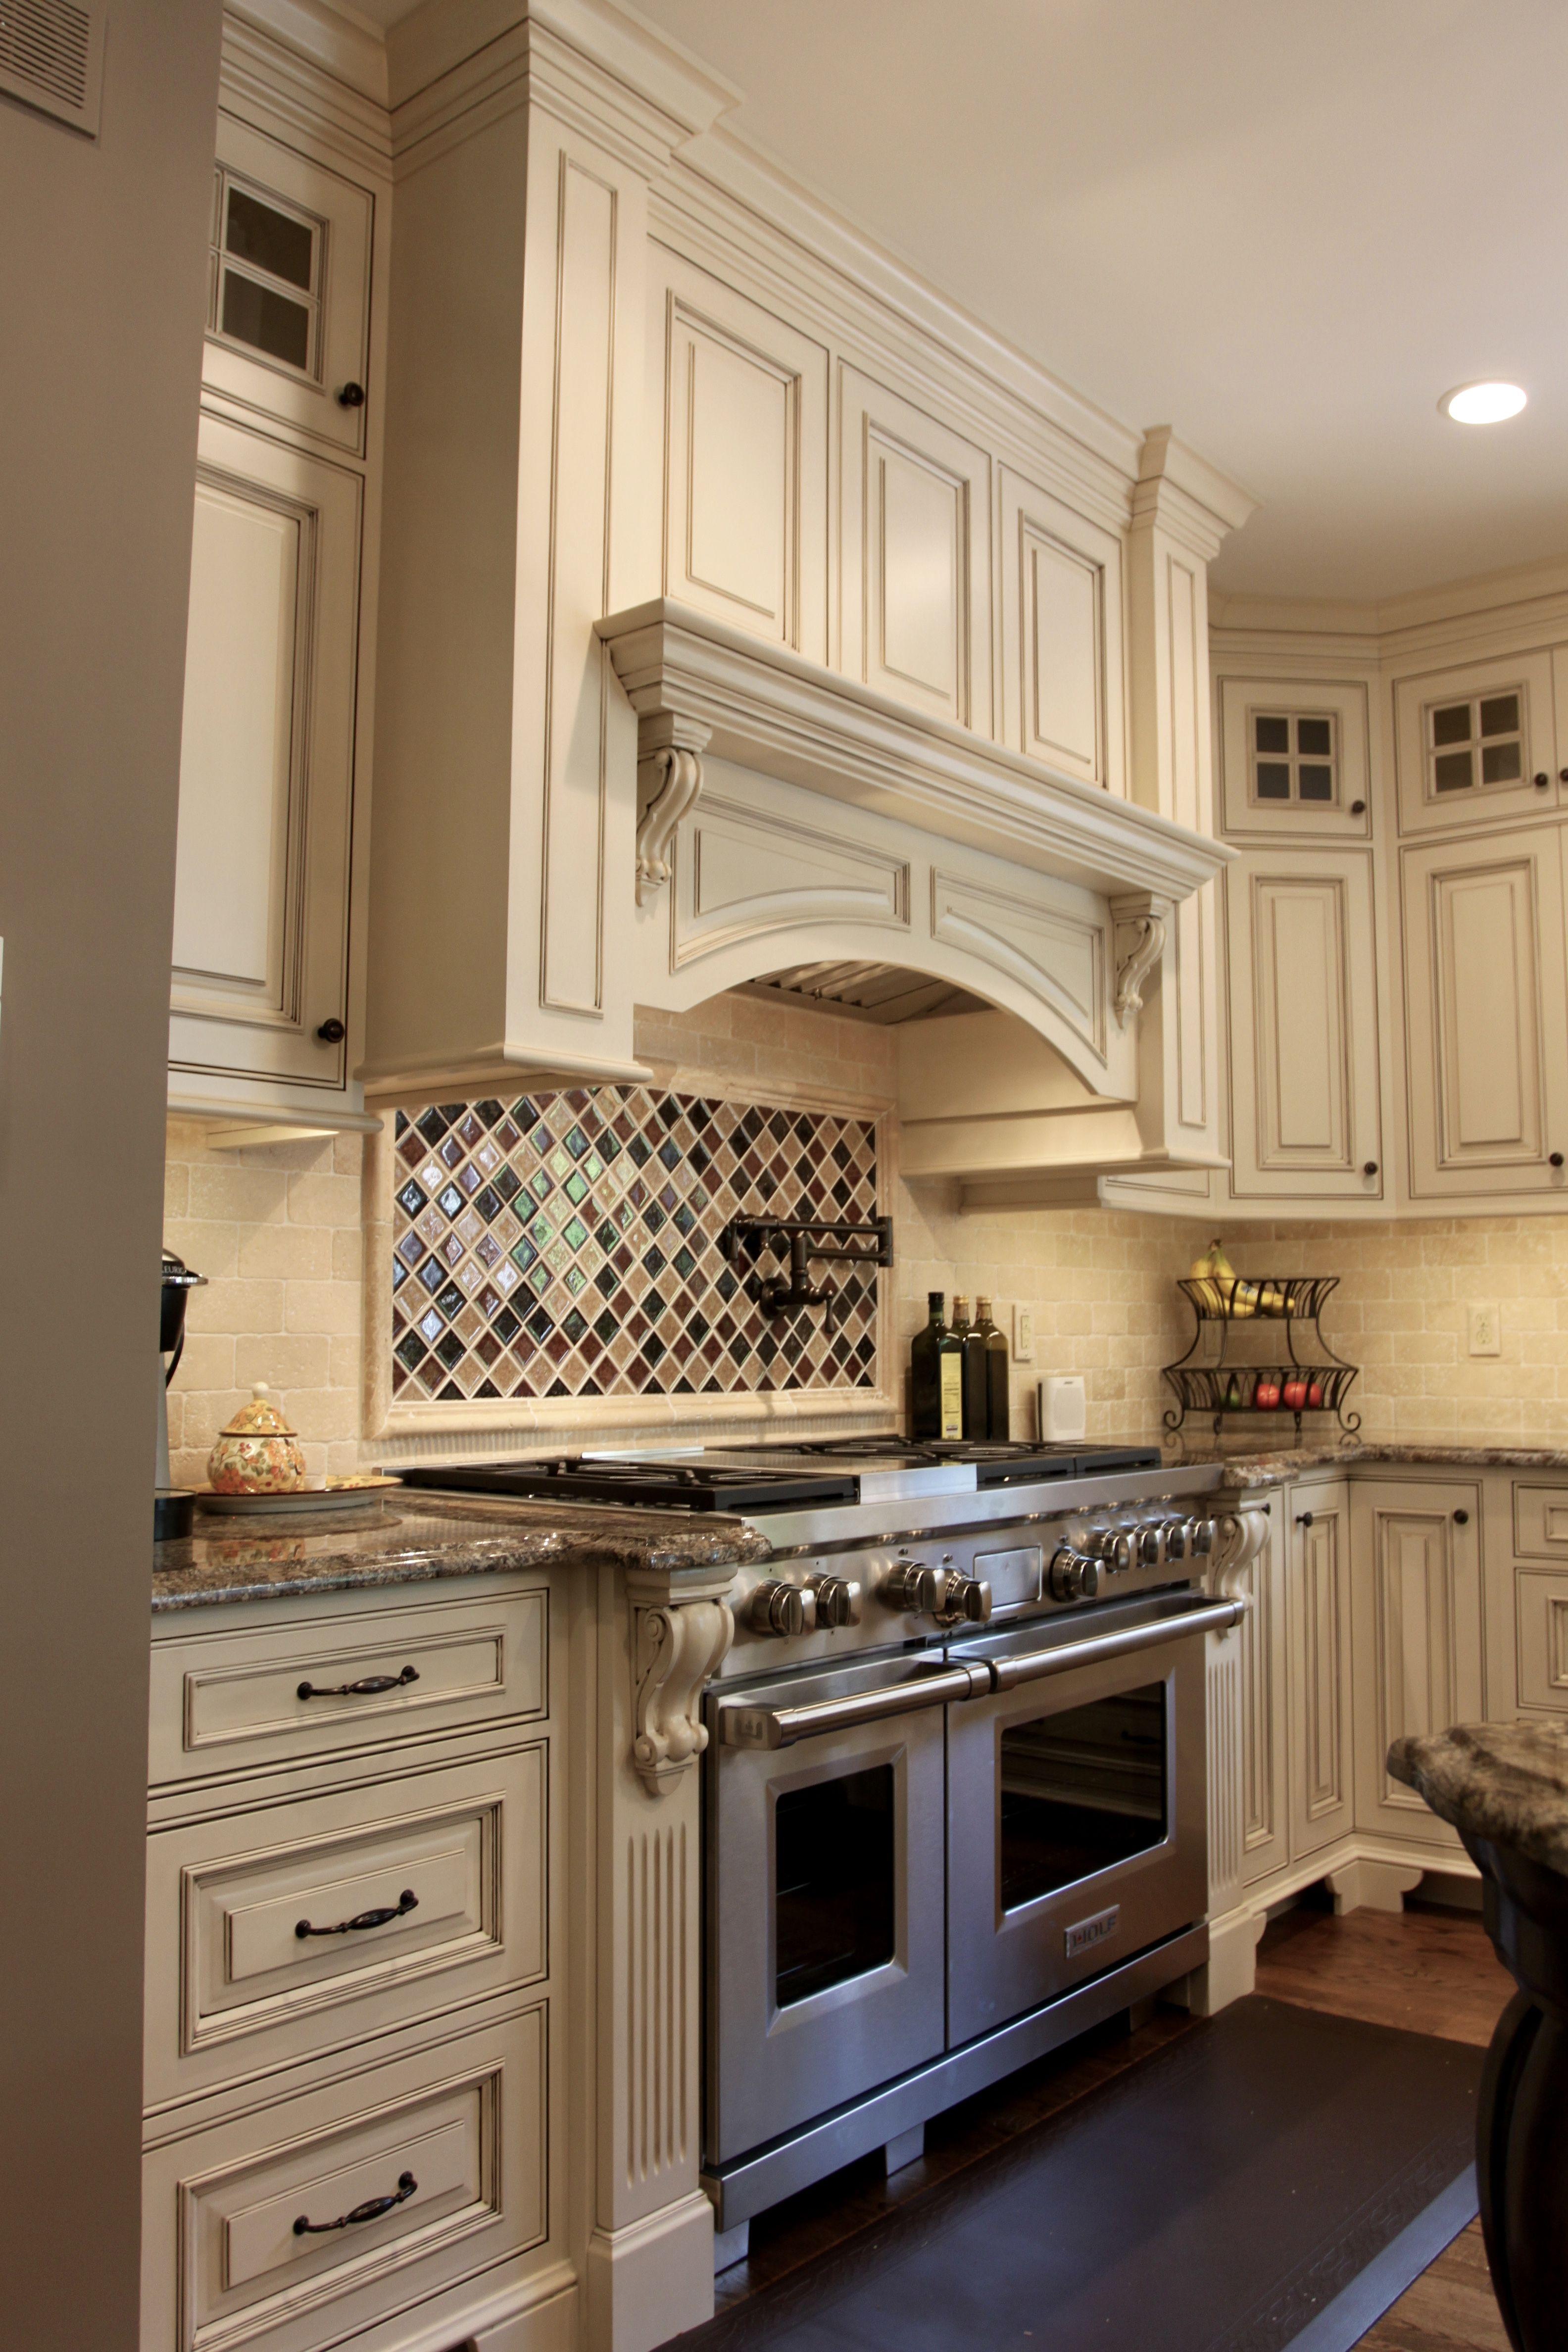 Custom Wood Hood Farmhouse Kitchen Cabinets Kitchen Range Hood Kitchen Remodel